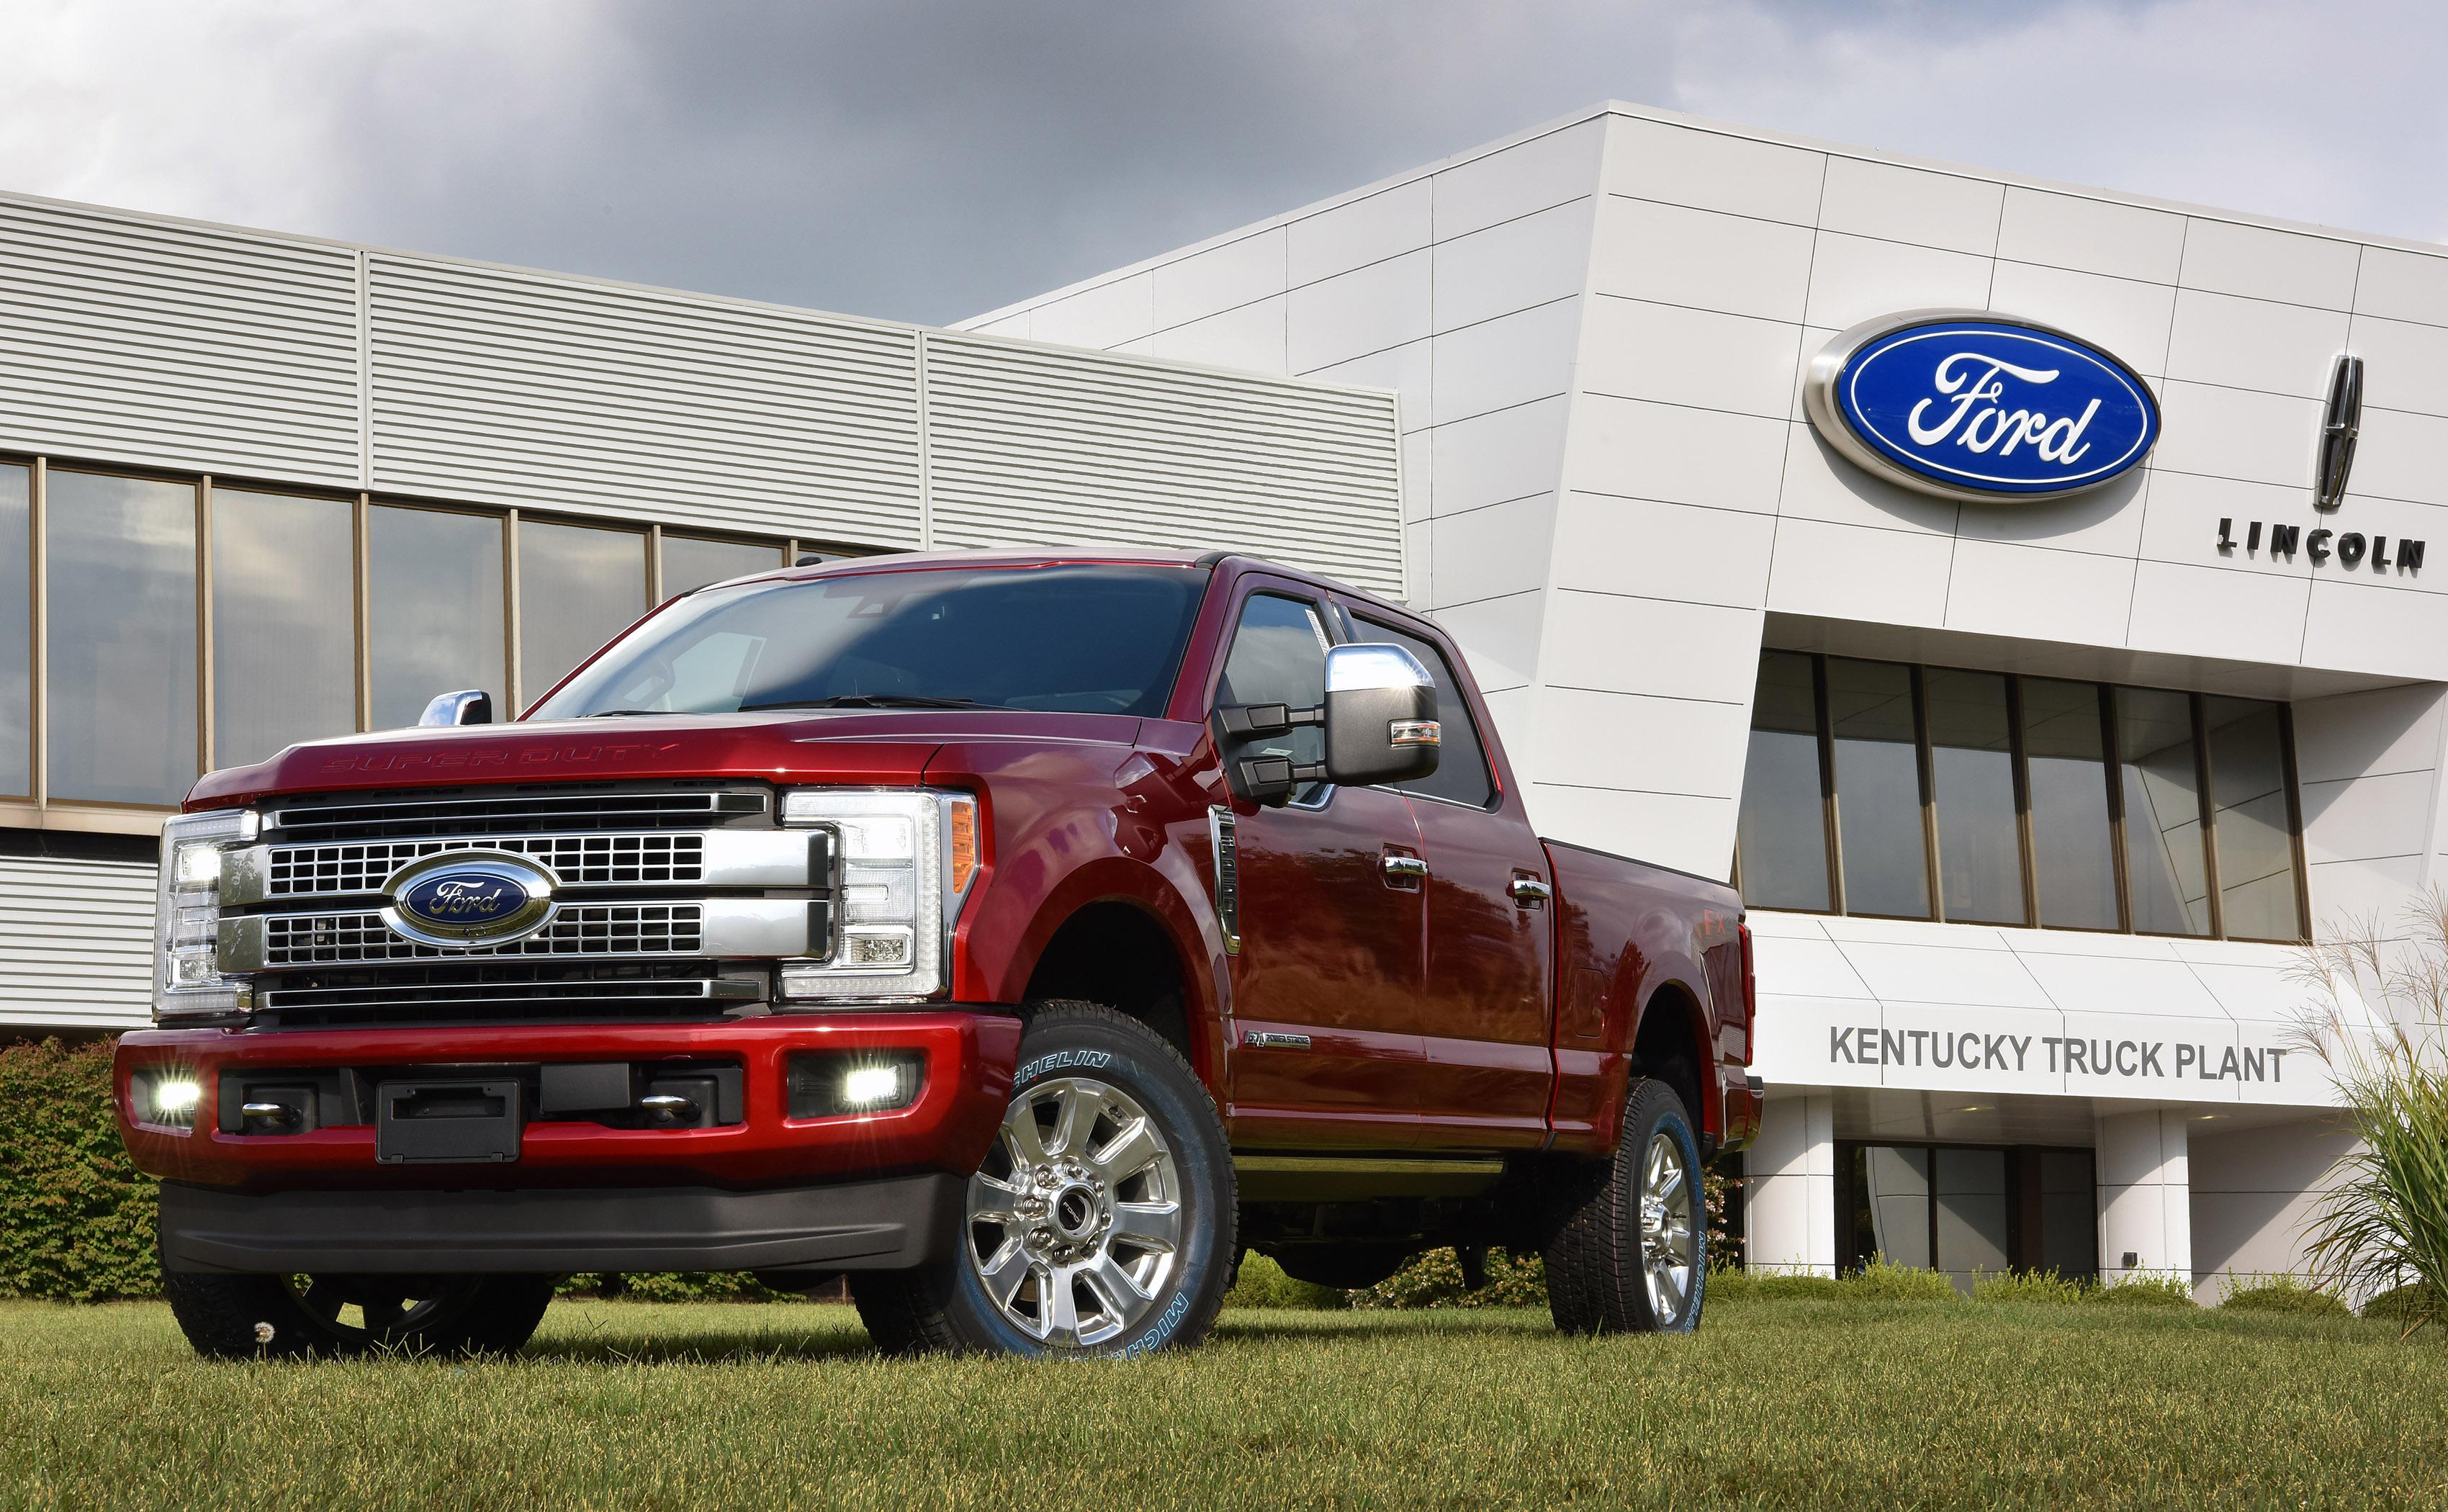 Ford Recalls Super Duty Trucks for Fire Risk